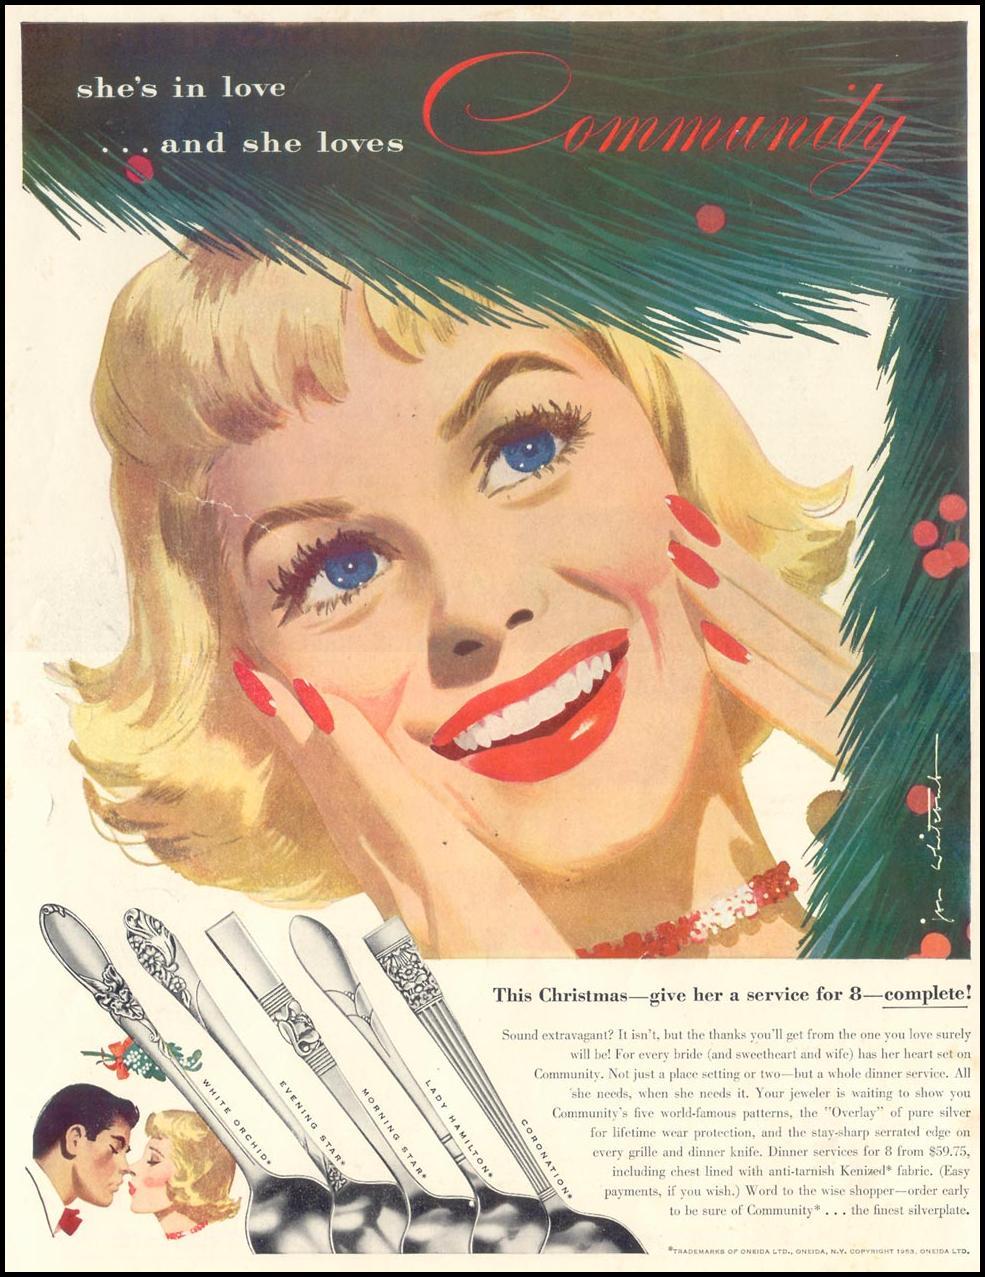 ONEIDA SILVERPLATE LIFE 11/30/1953 INSIDE FRONT